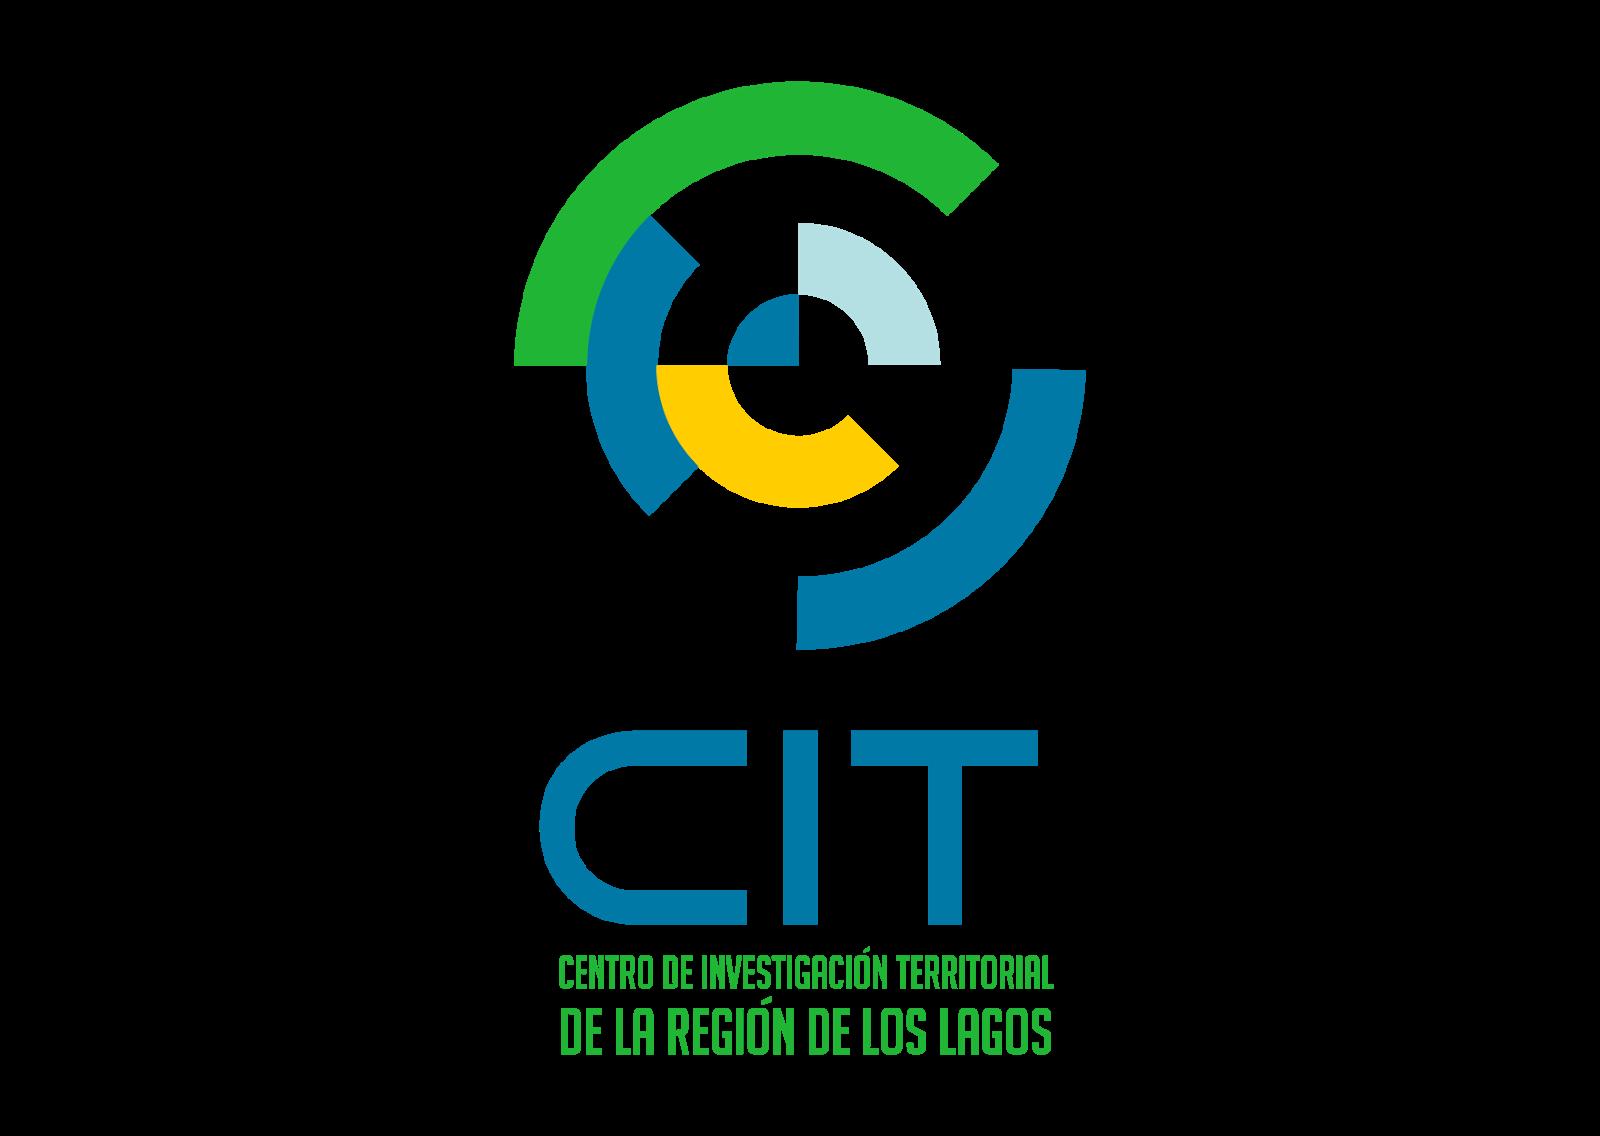 Cit Logo Vector - Cit Vector, Transparent background PNG HD thumbnail